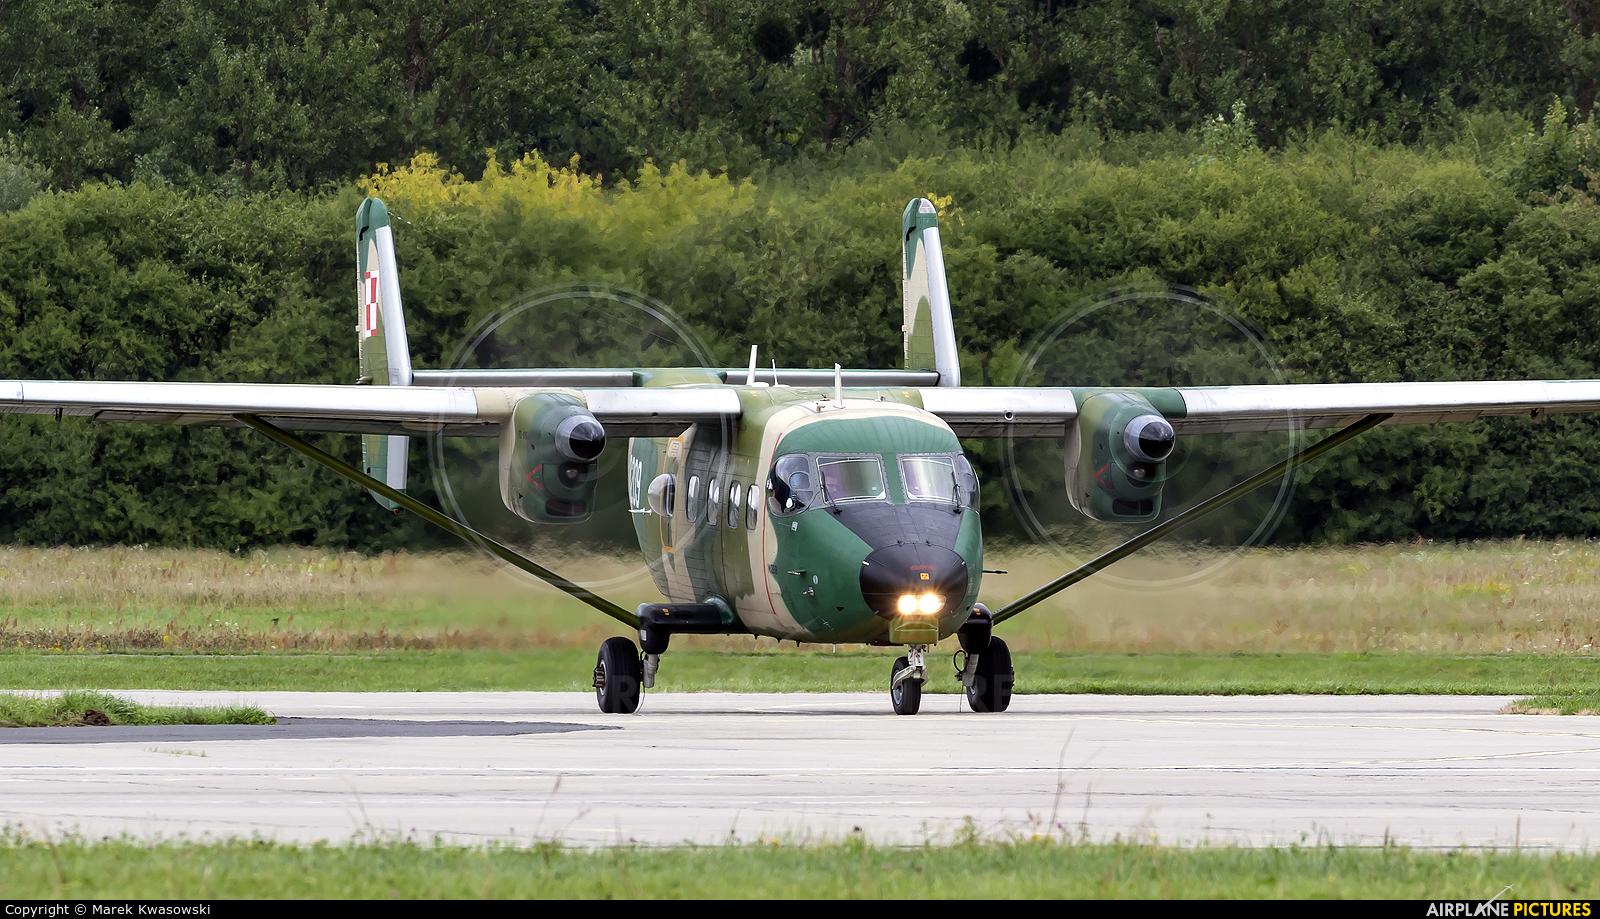 Poland - Air Force 0209 aircraft at Gdynia- Babie Doły (Oksywie)